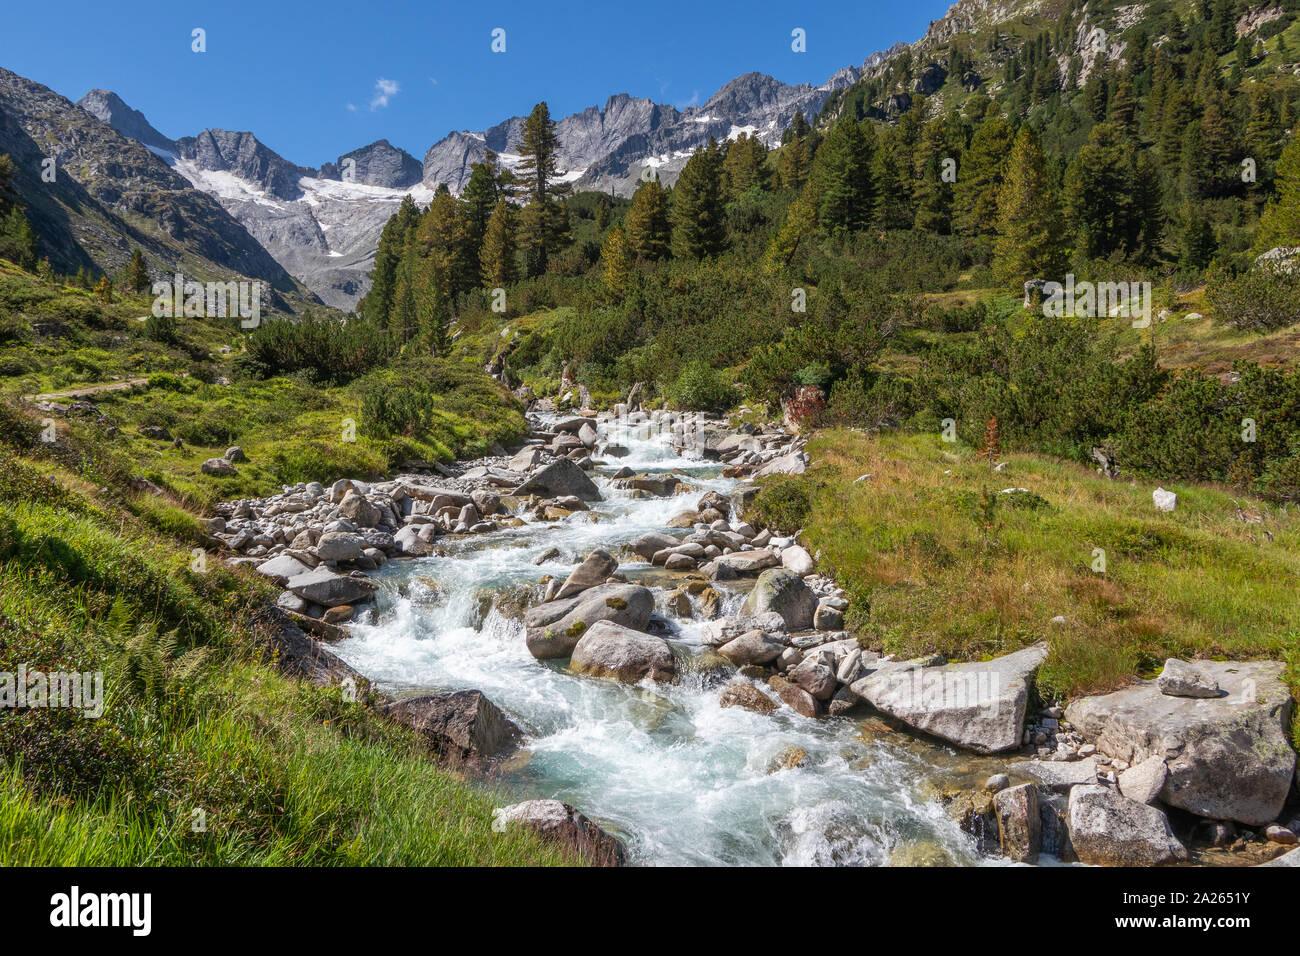 Rainbachtal valley alpine landscape, a side valley of the Krimmler Achental. Hohe Tauern National Park. Austrian Alps. Stock Photo